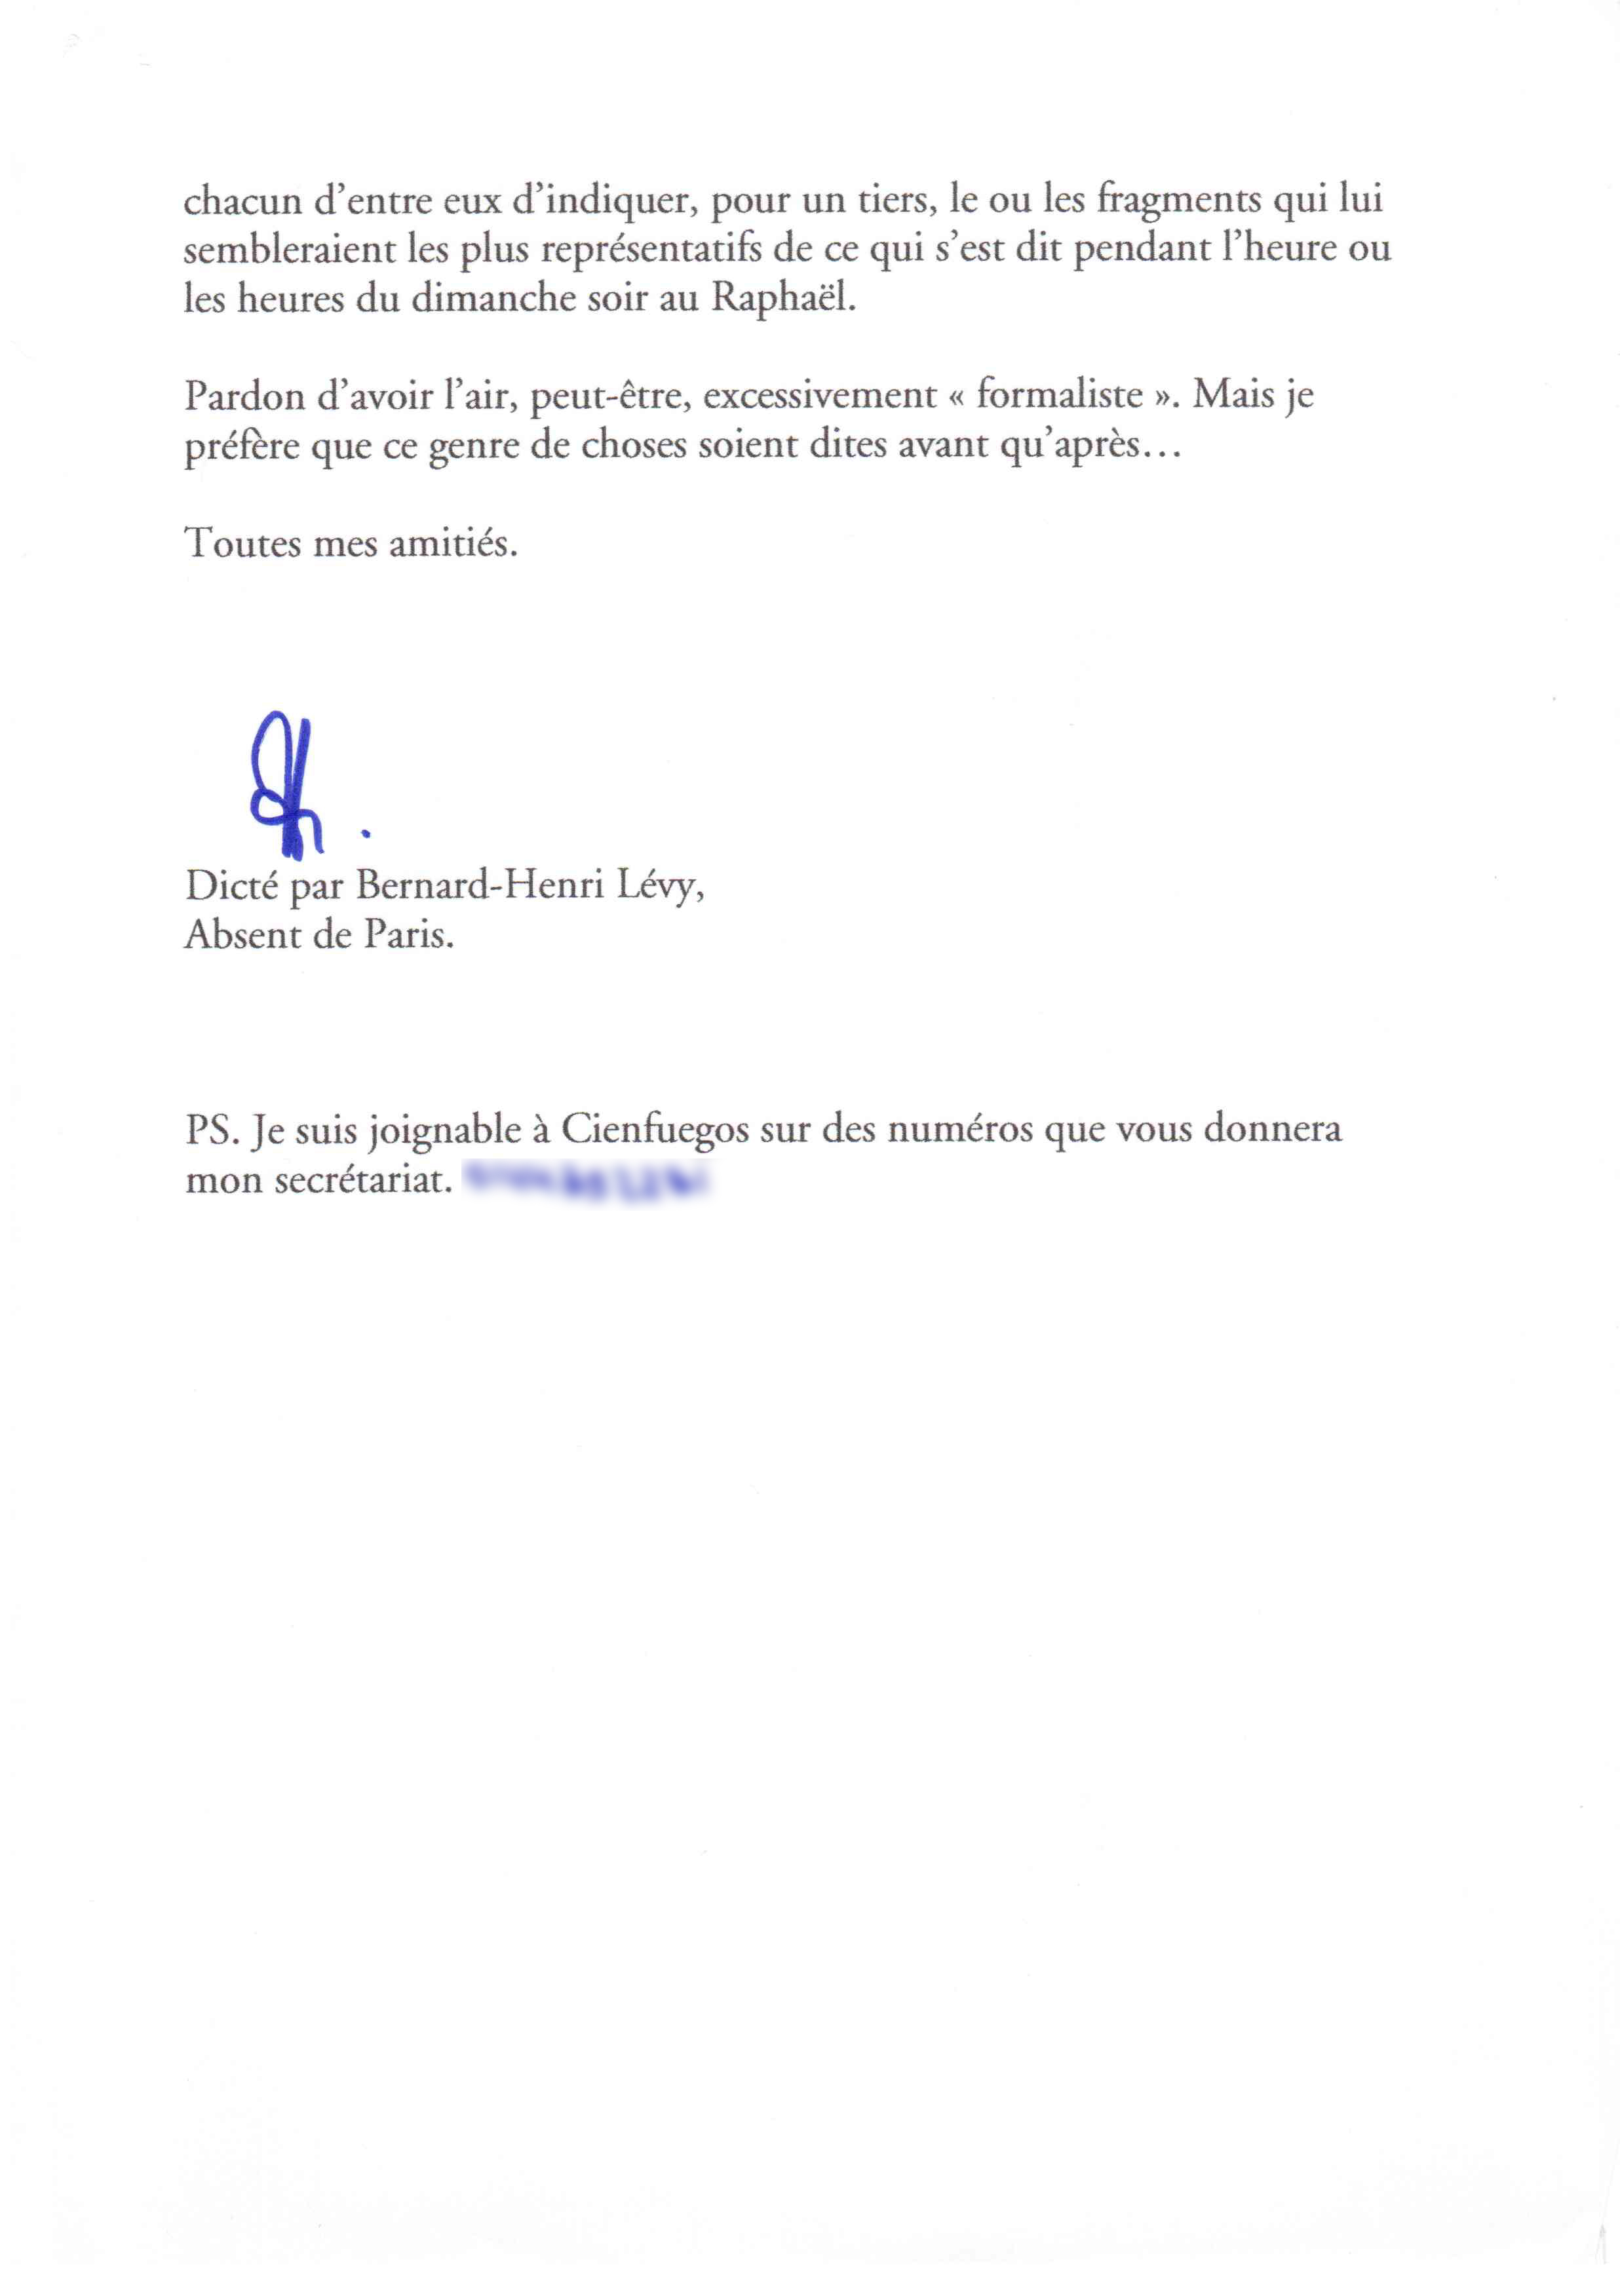 Document 6, partie 2